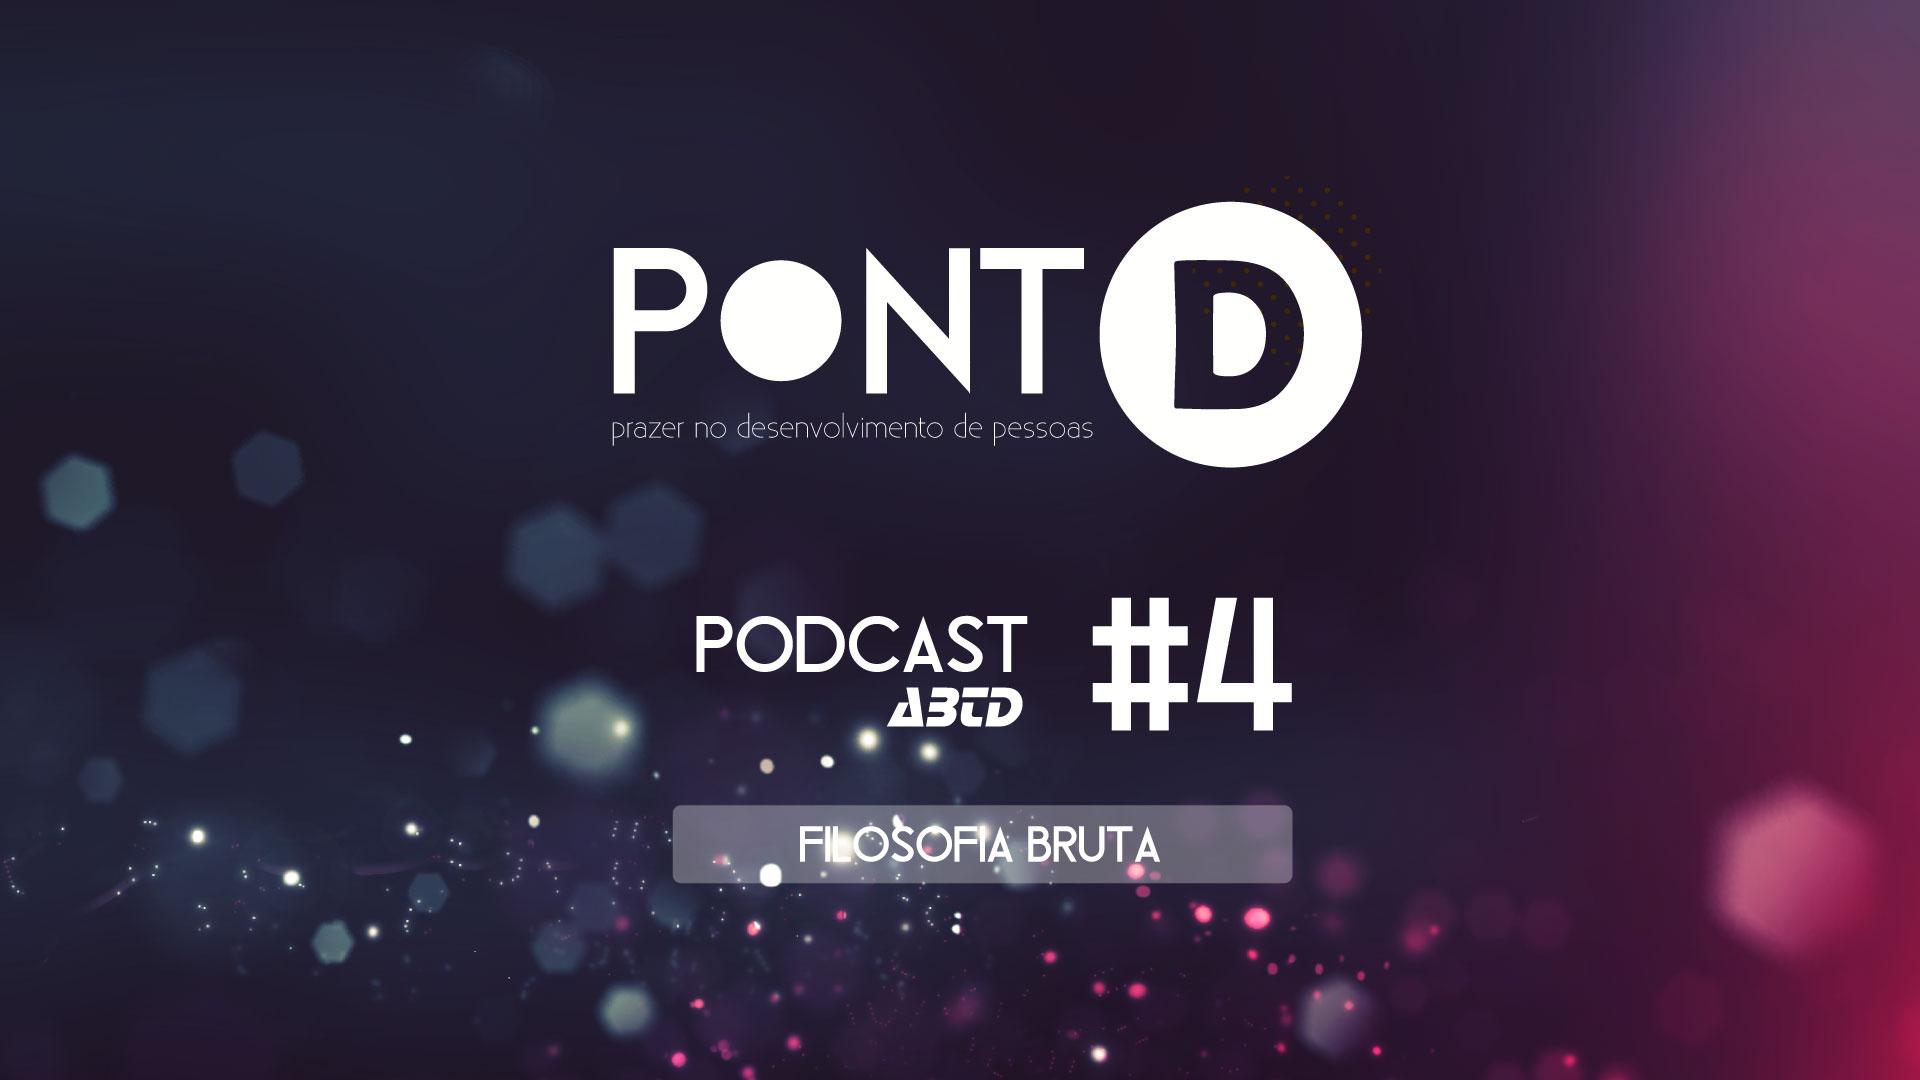 EPISÓDIO 4 - FILOSOFIA BRUTA!